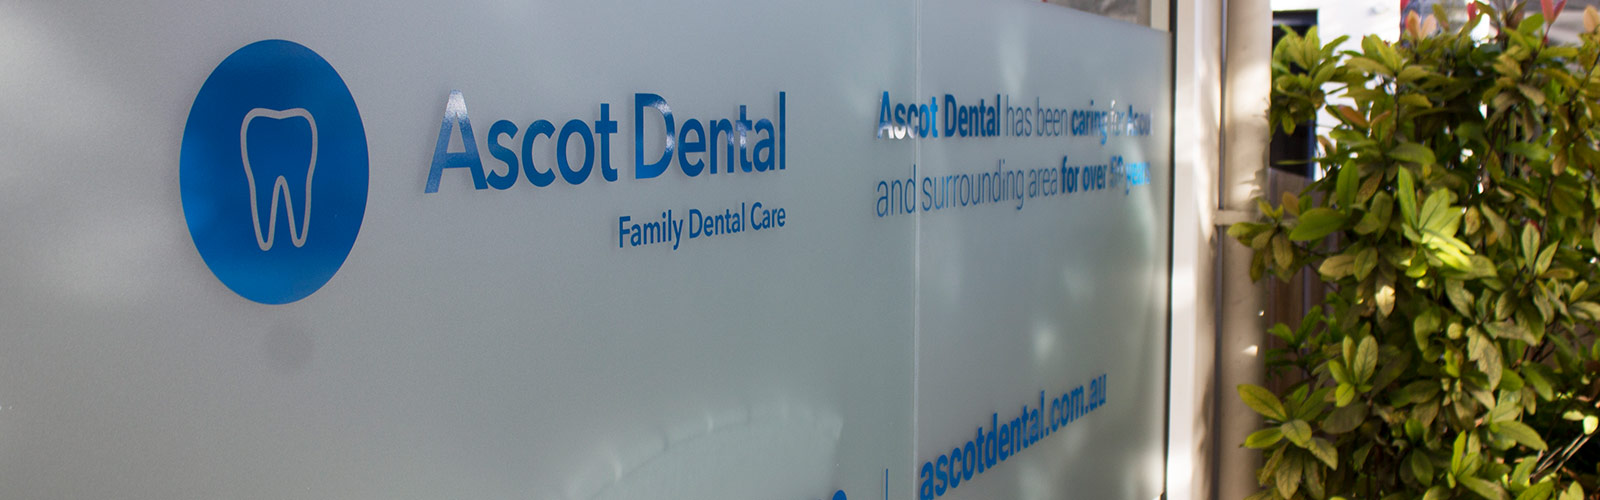 Ascot Dental Signage